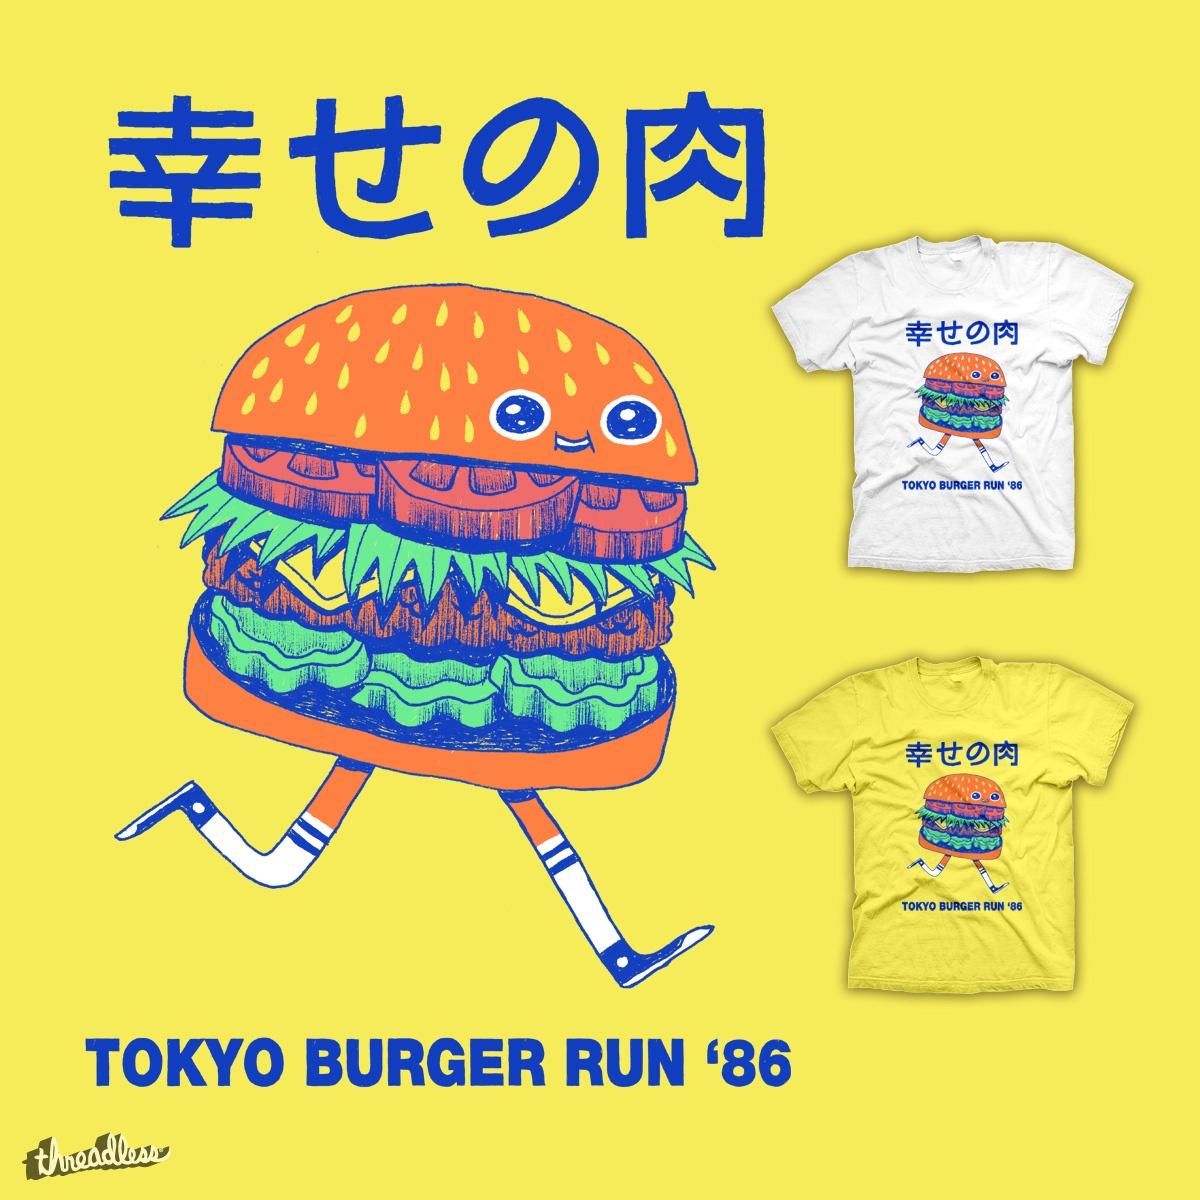 Burgerman by zackOlantern on Threadless